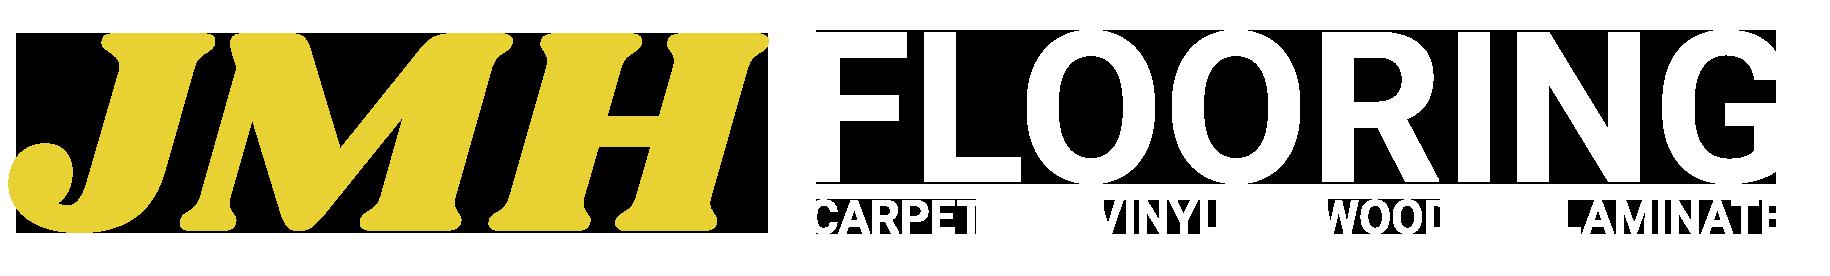 JMH Flooring Logo